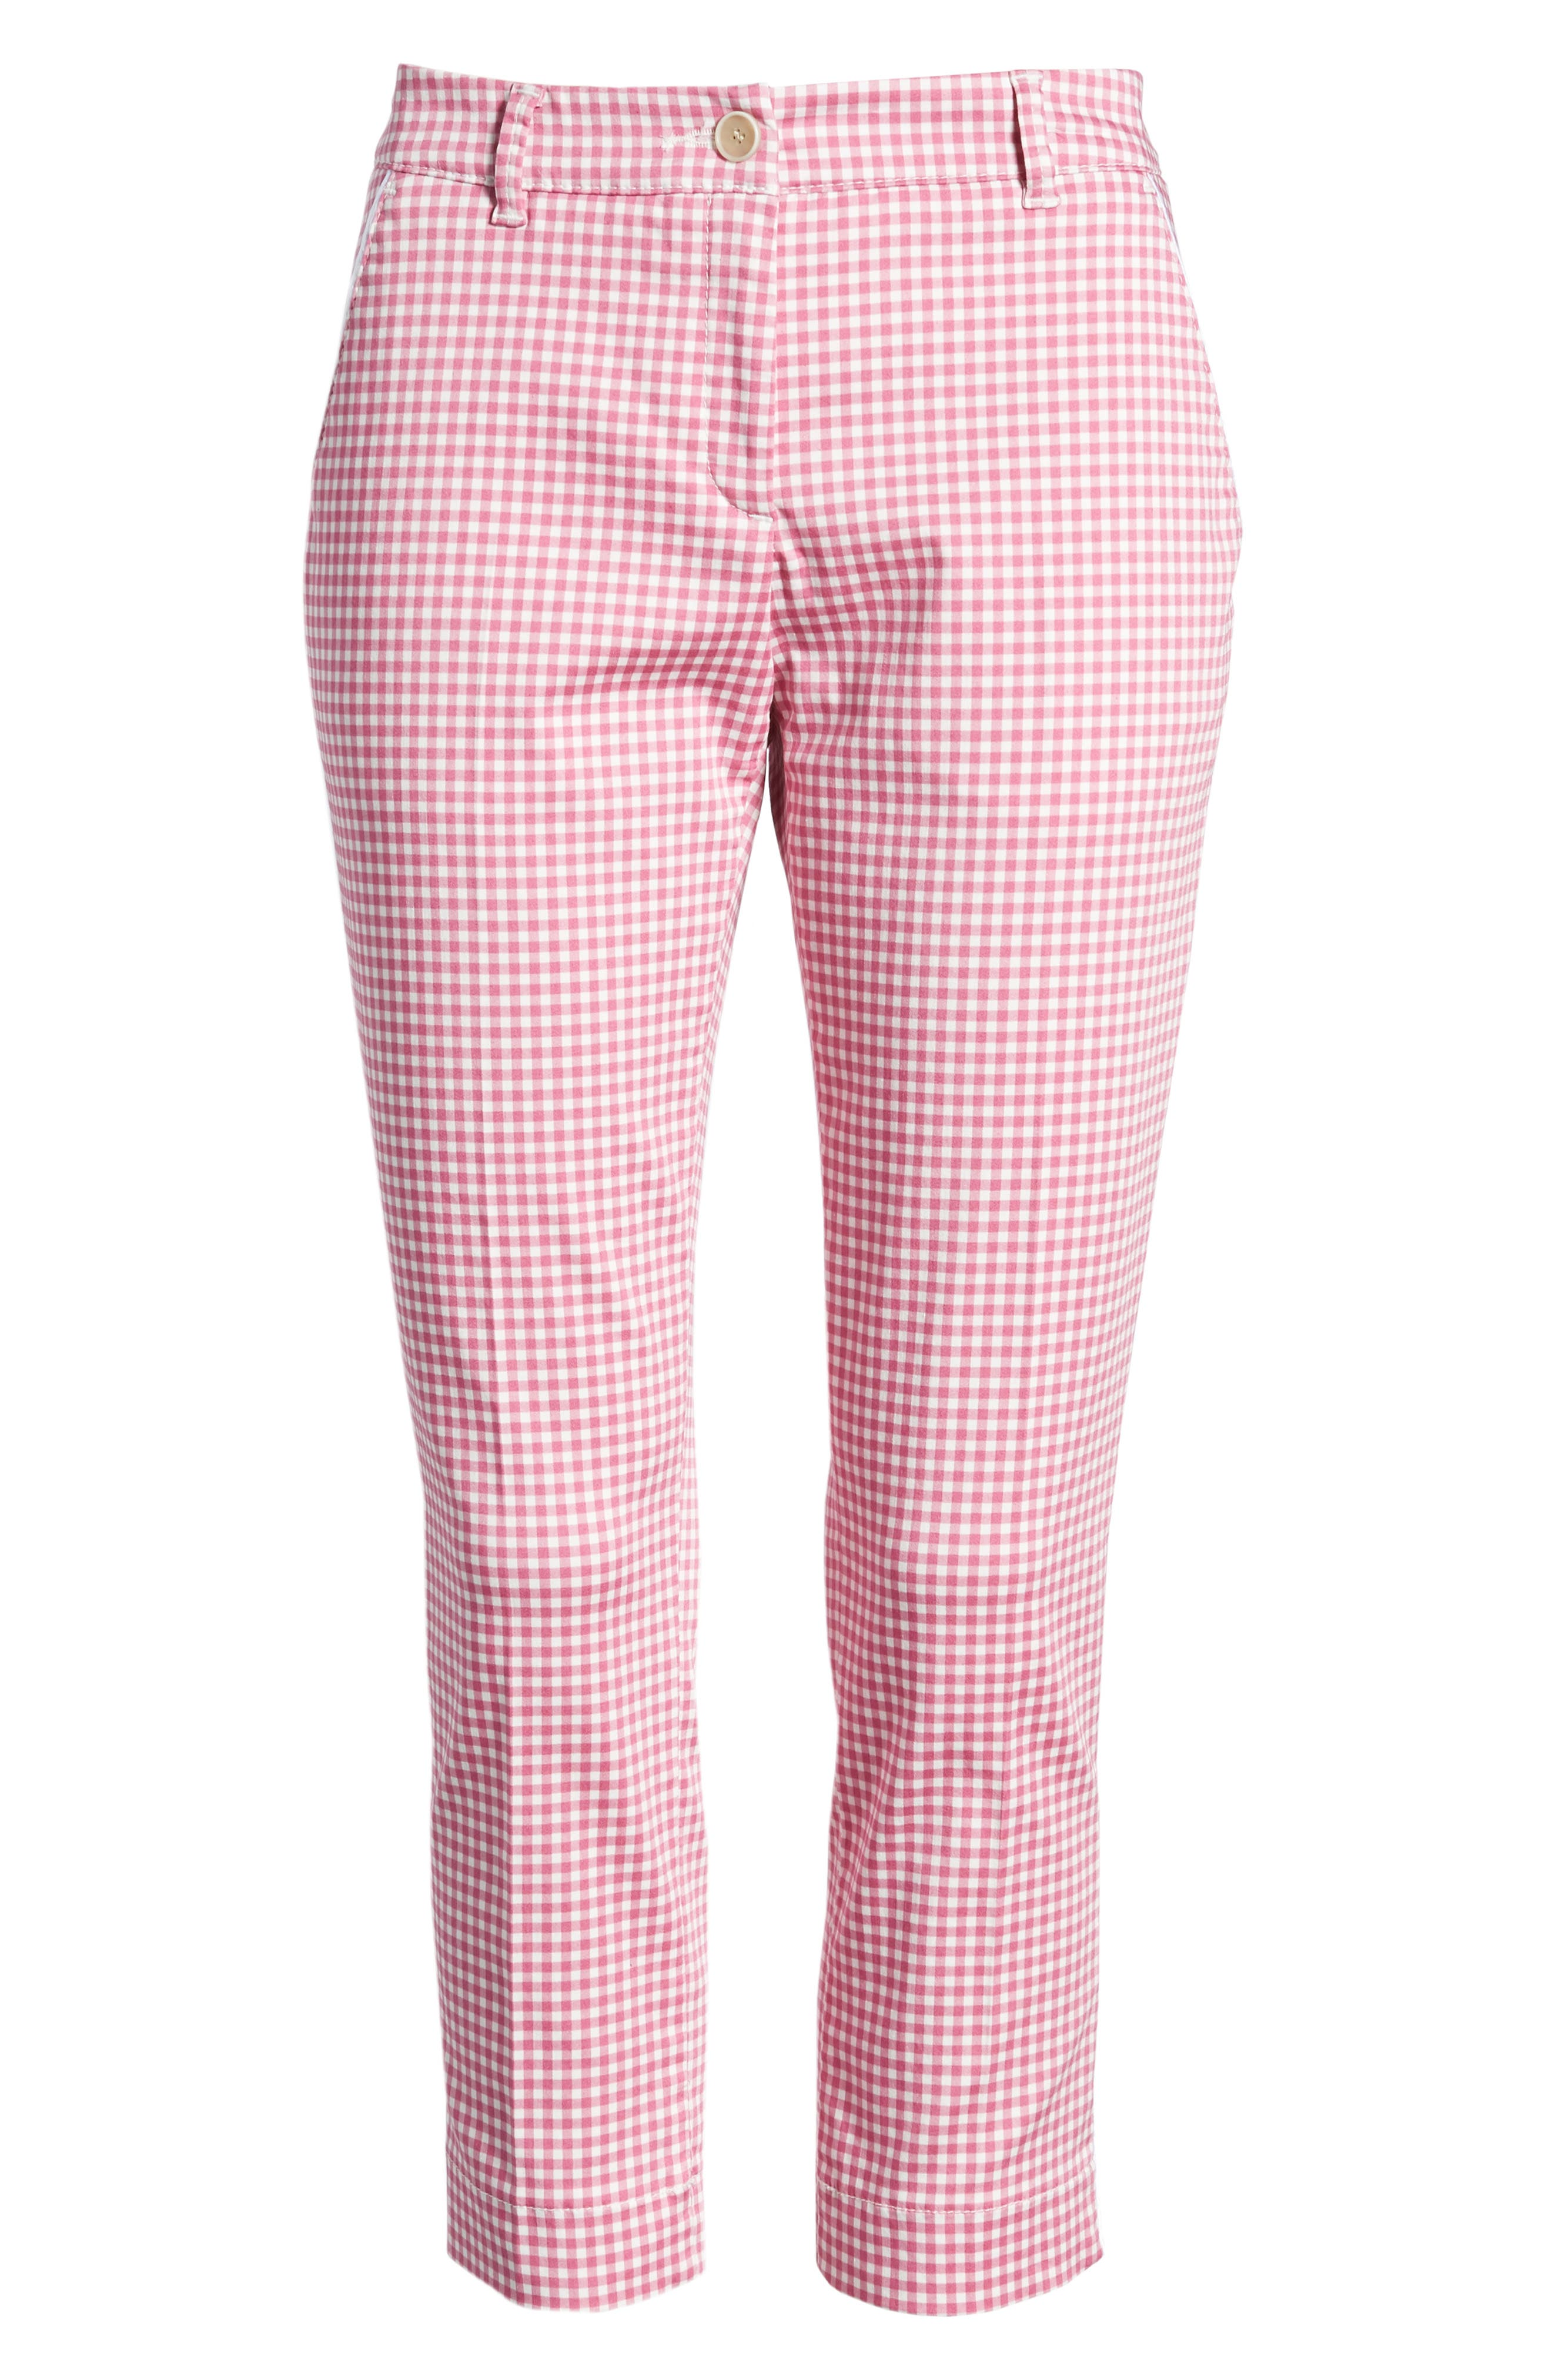 Maron Gingham Stretch Cotton Pants,                             Alternate thumbnail 6, color,                             Pink